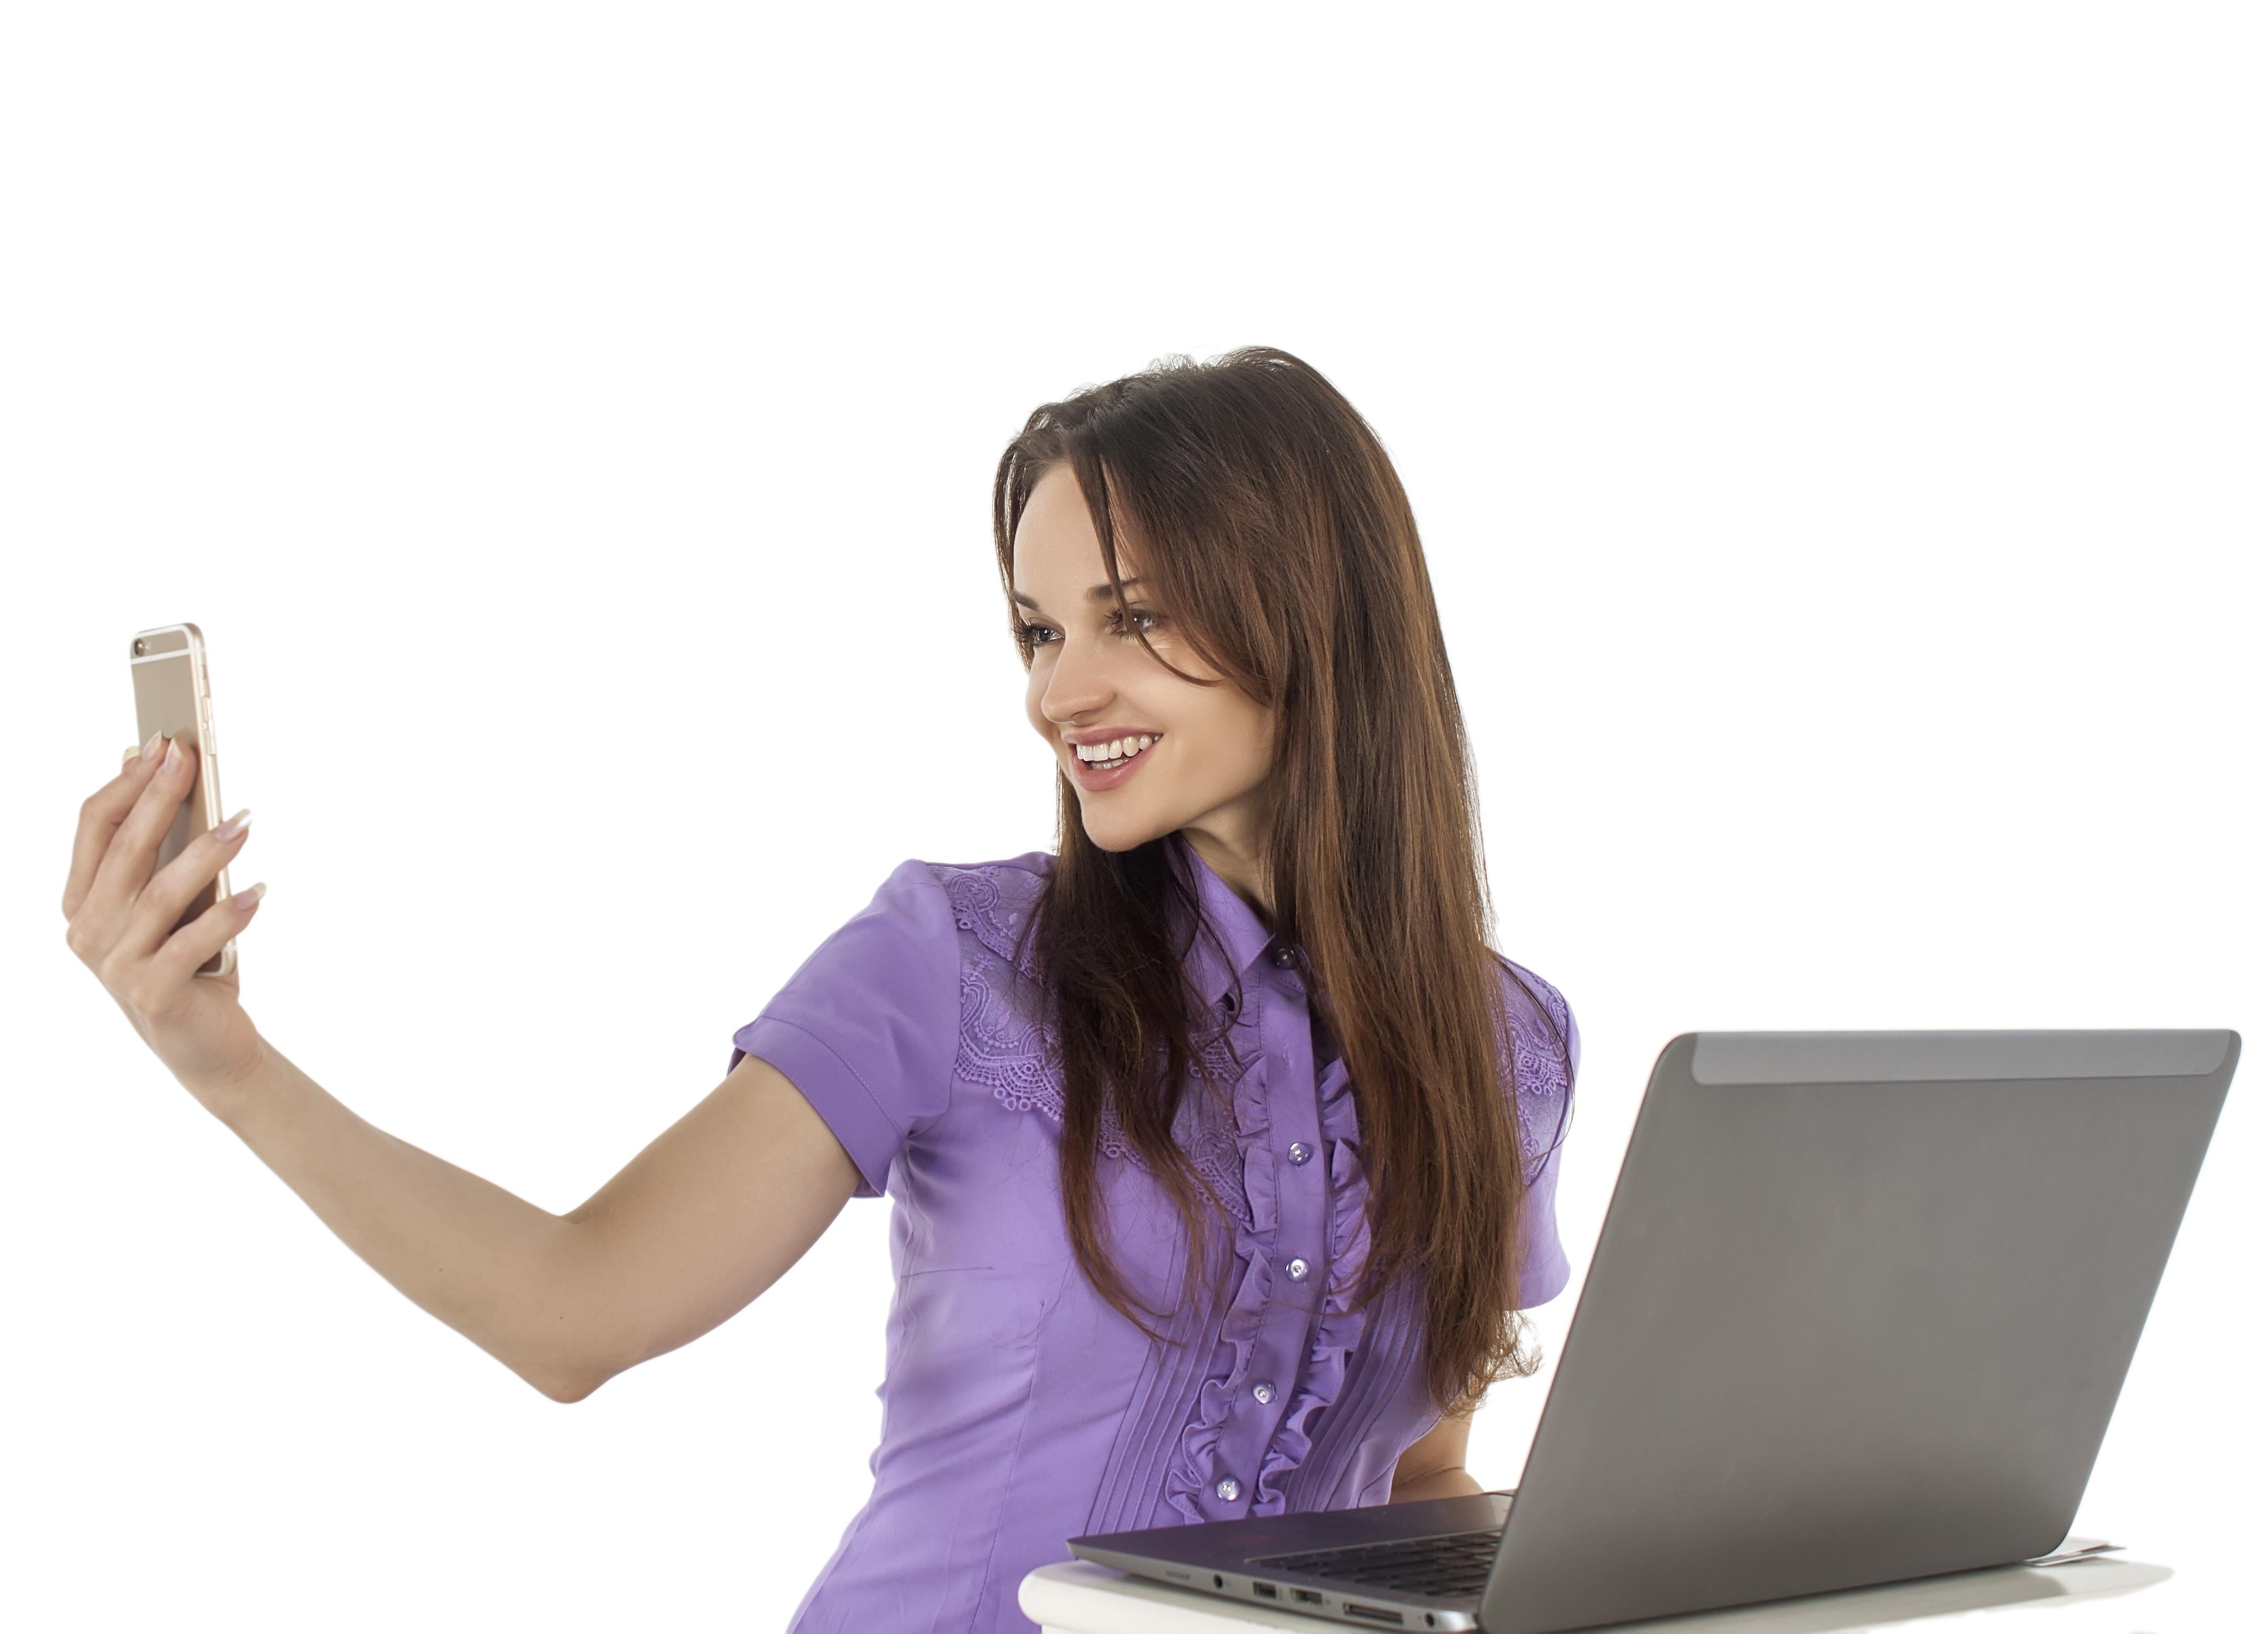 Работа на телефоне для девушки веб девушка модель мужчина спб